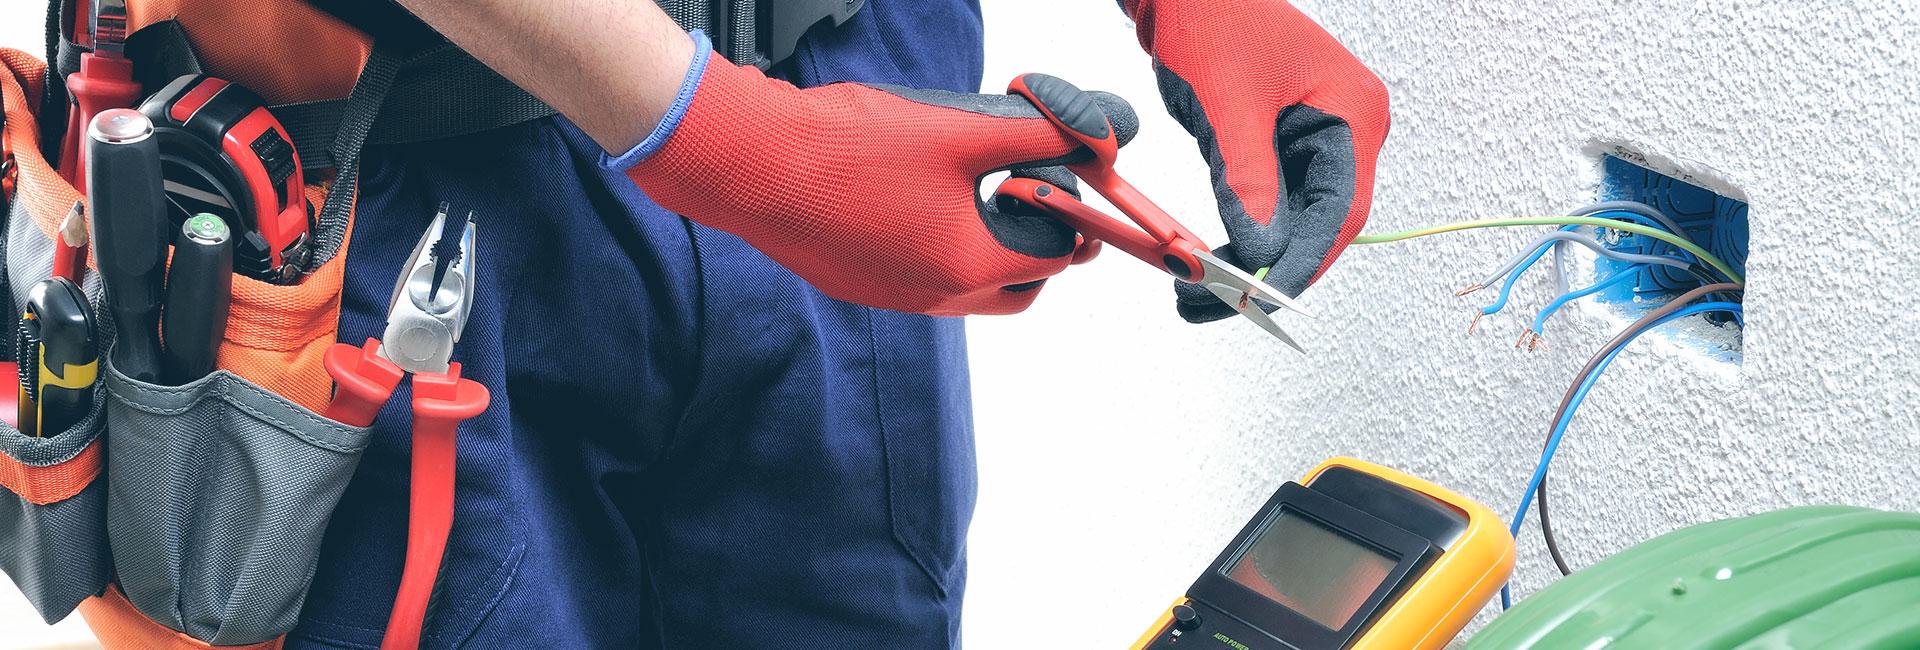 maintenance services backg home page